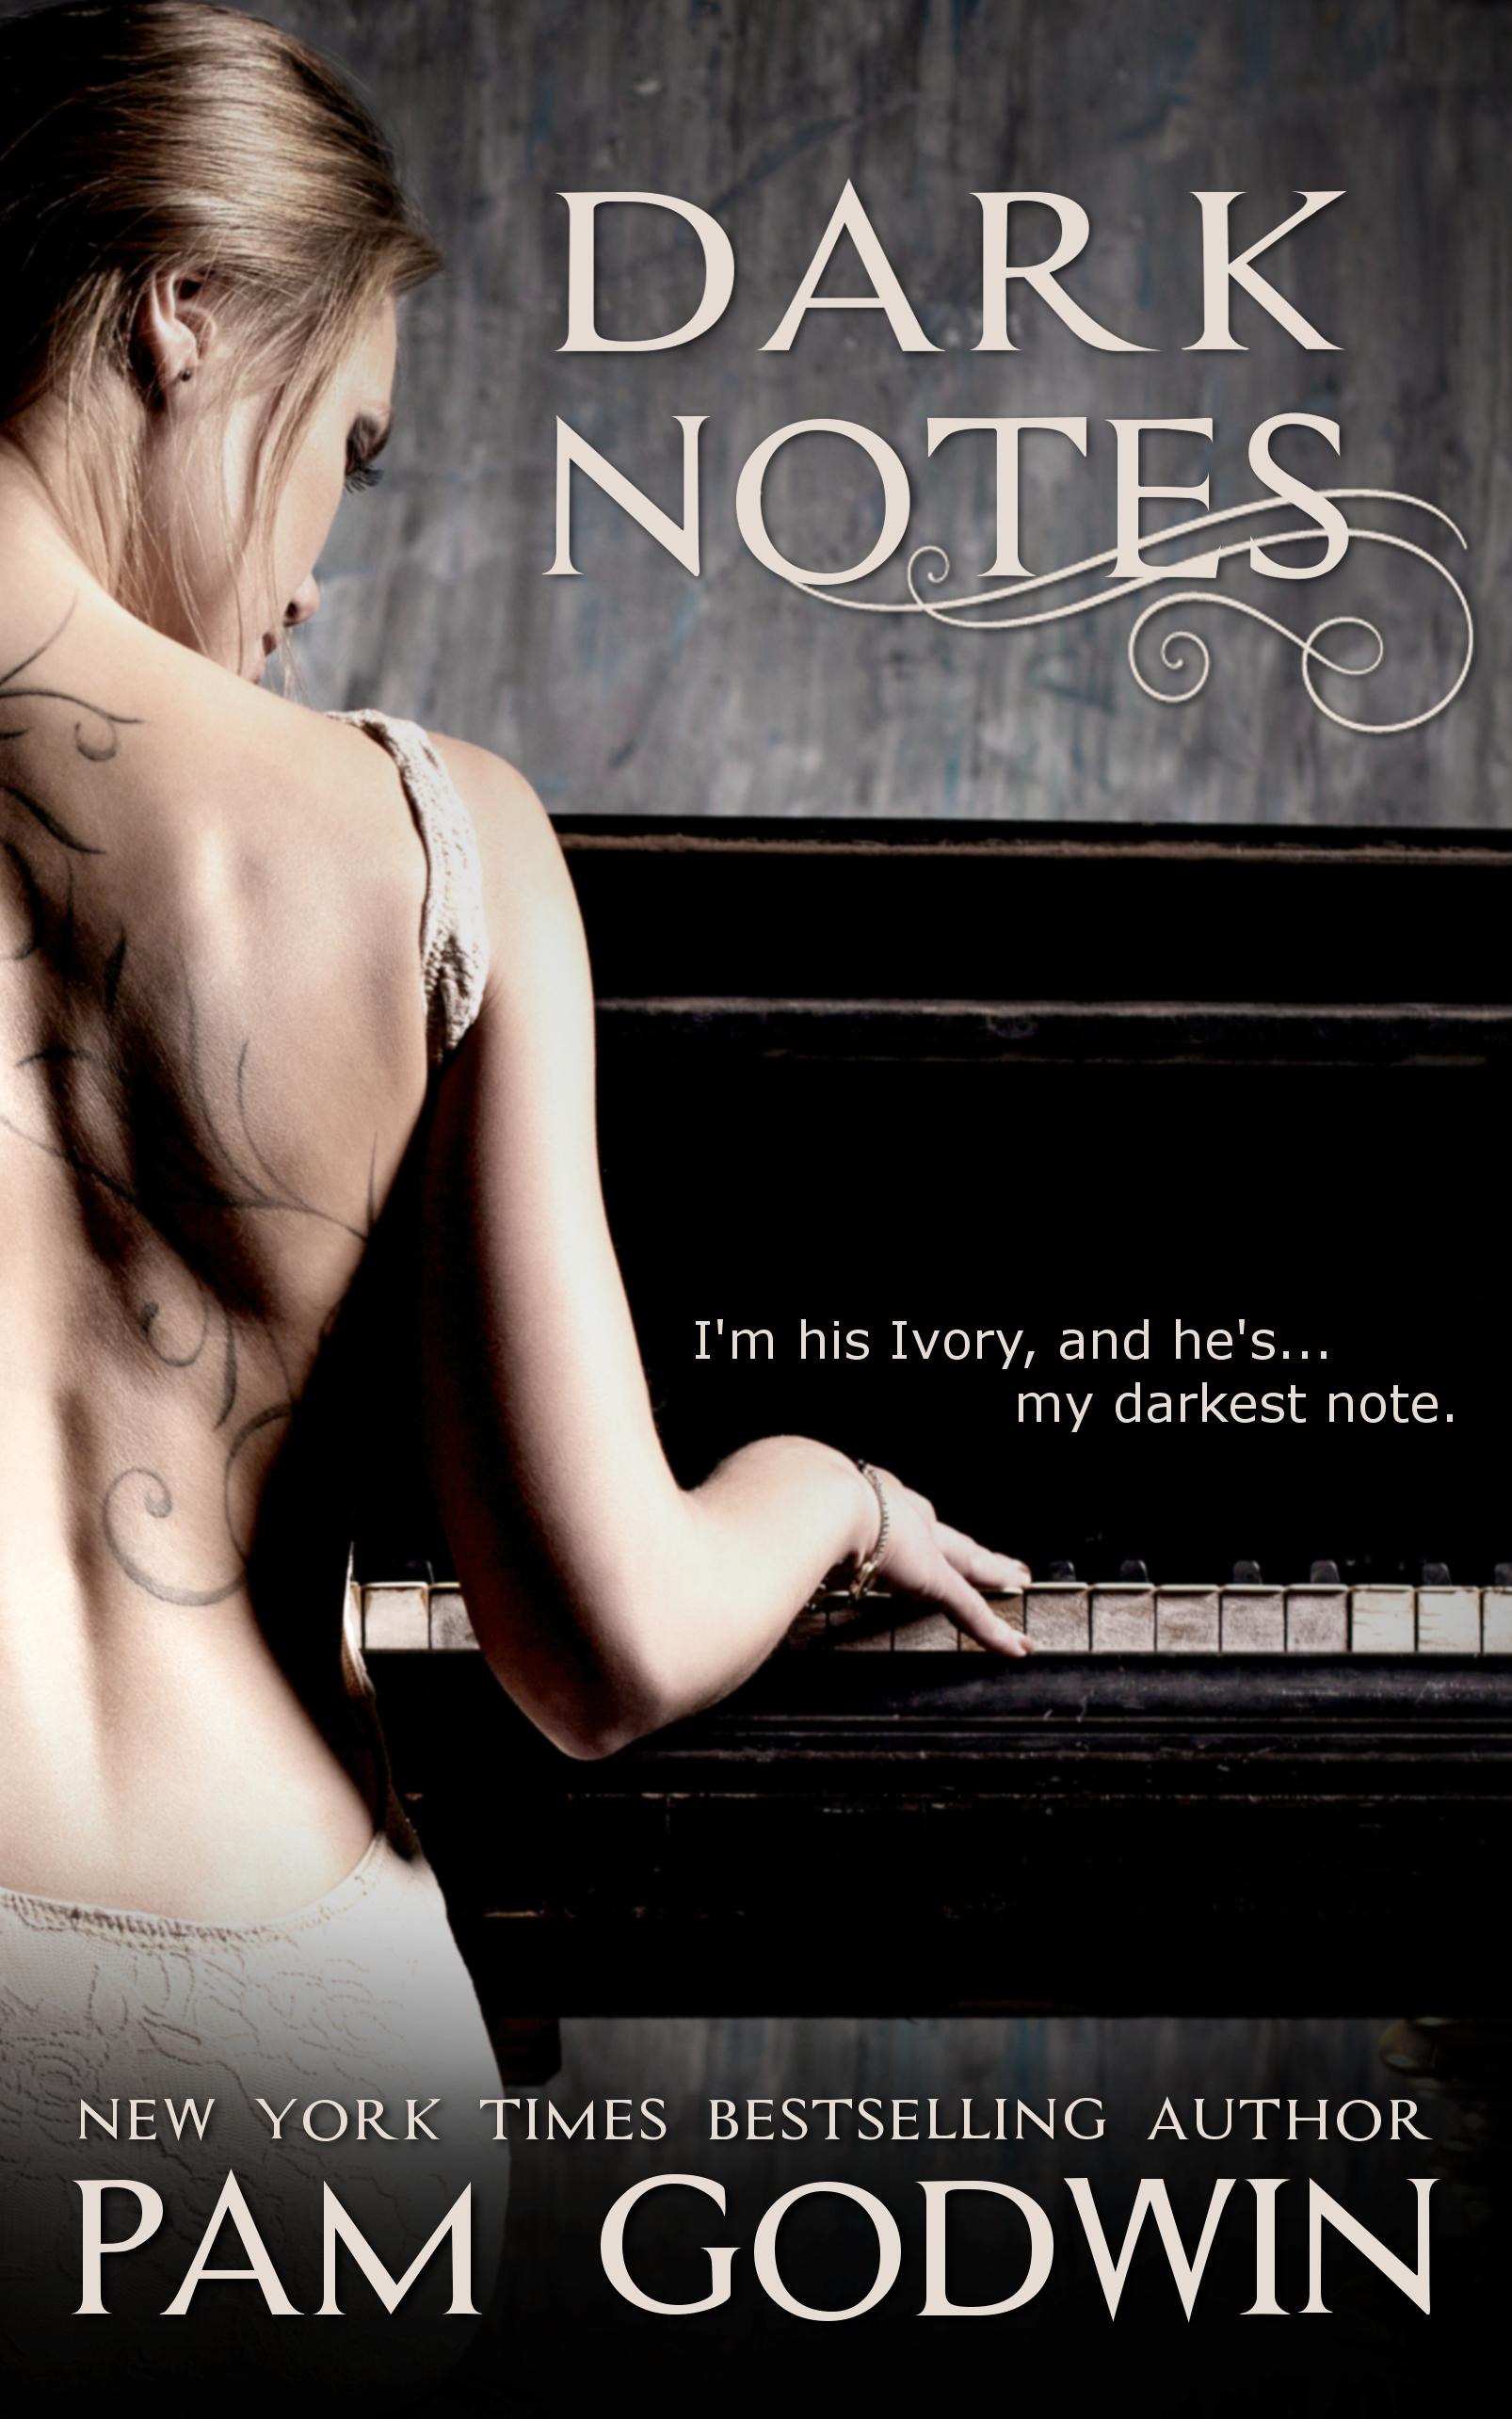 Dark Notes by Pam Godwin